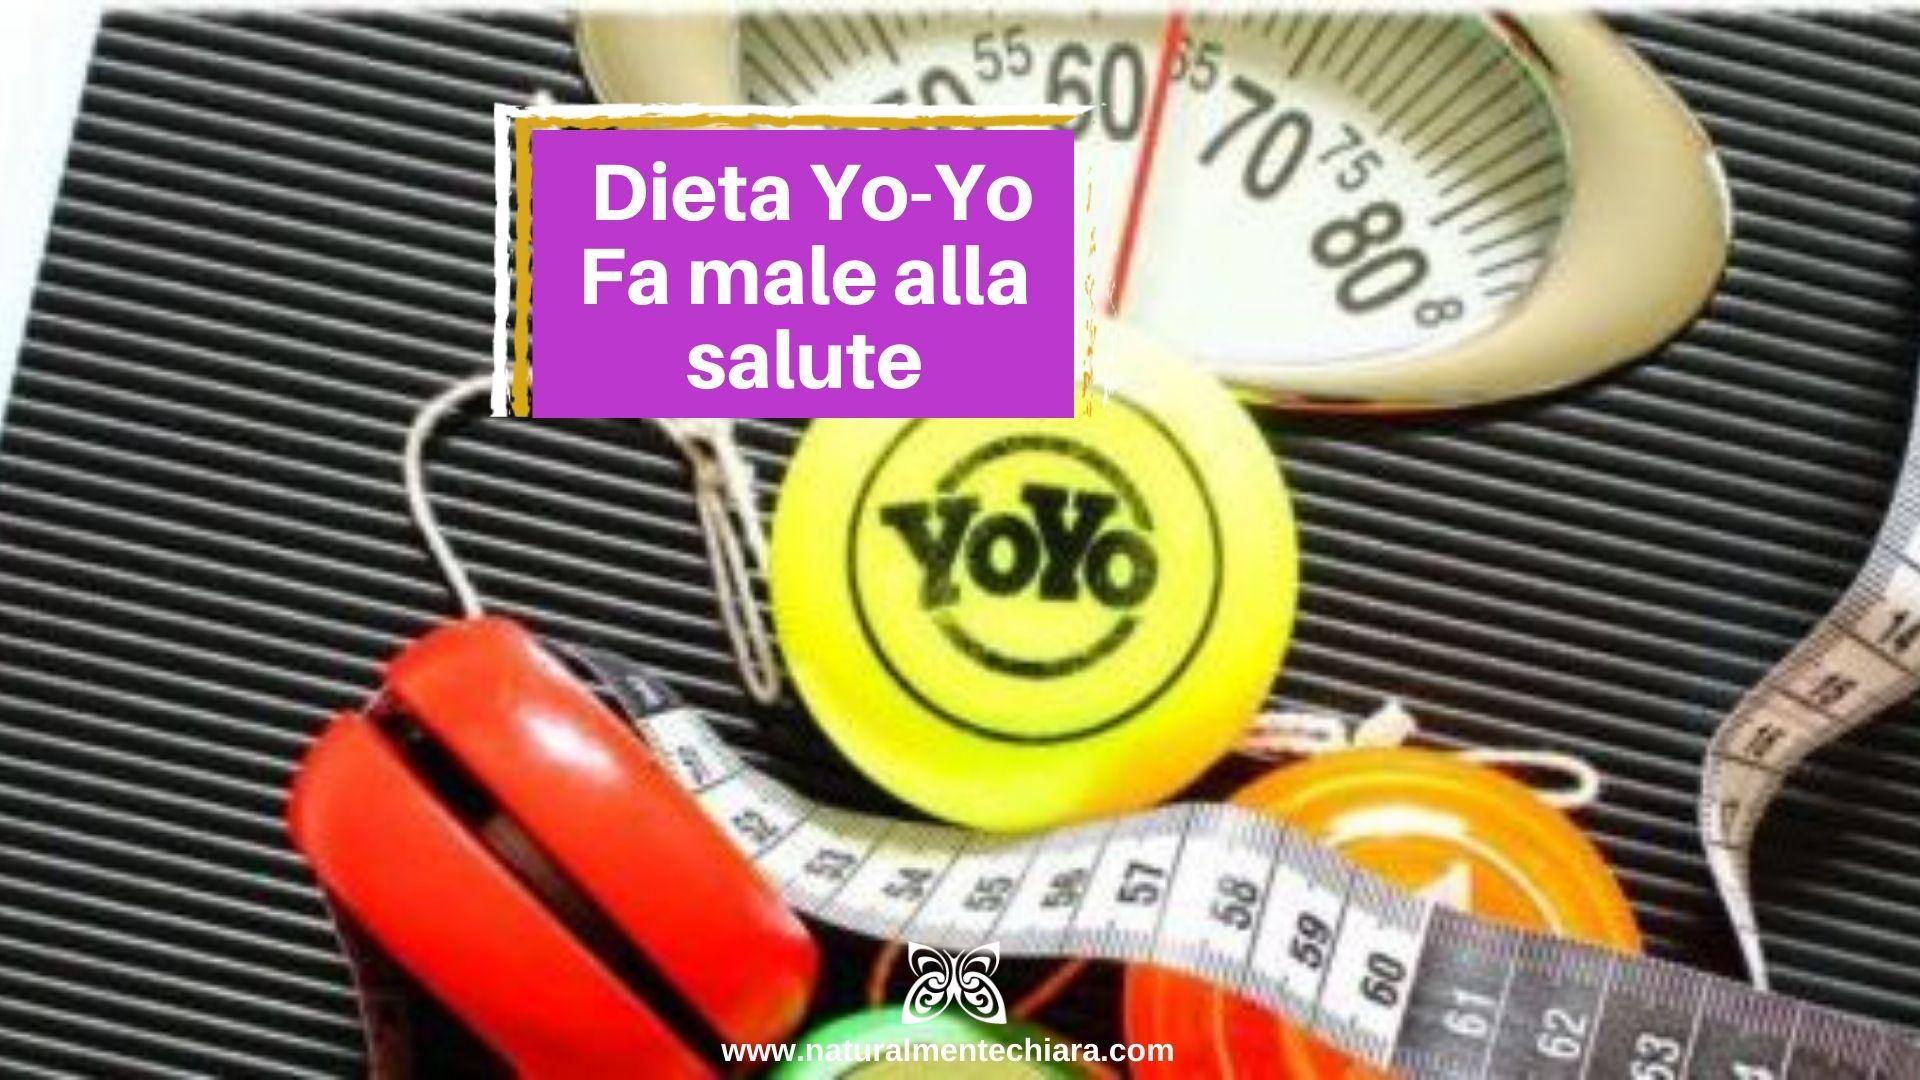 4 Orribili Effetti della Dieta Yo-Yo